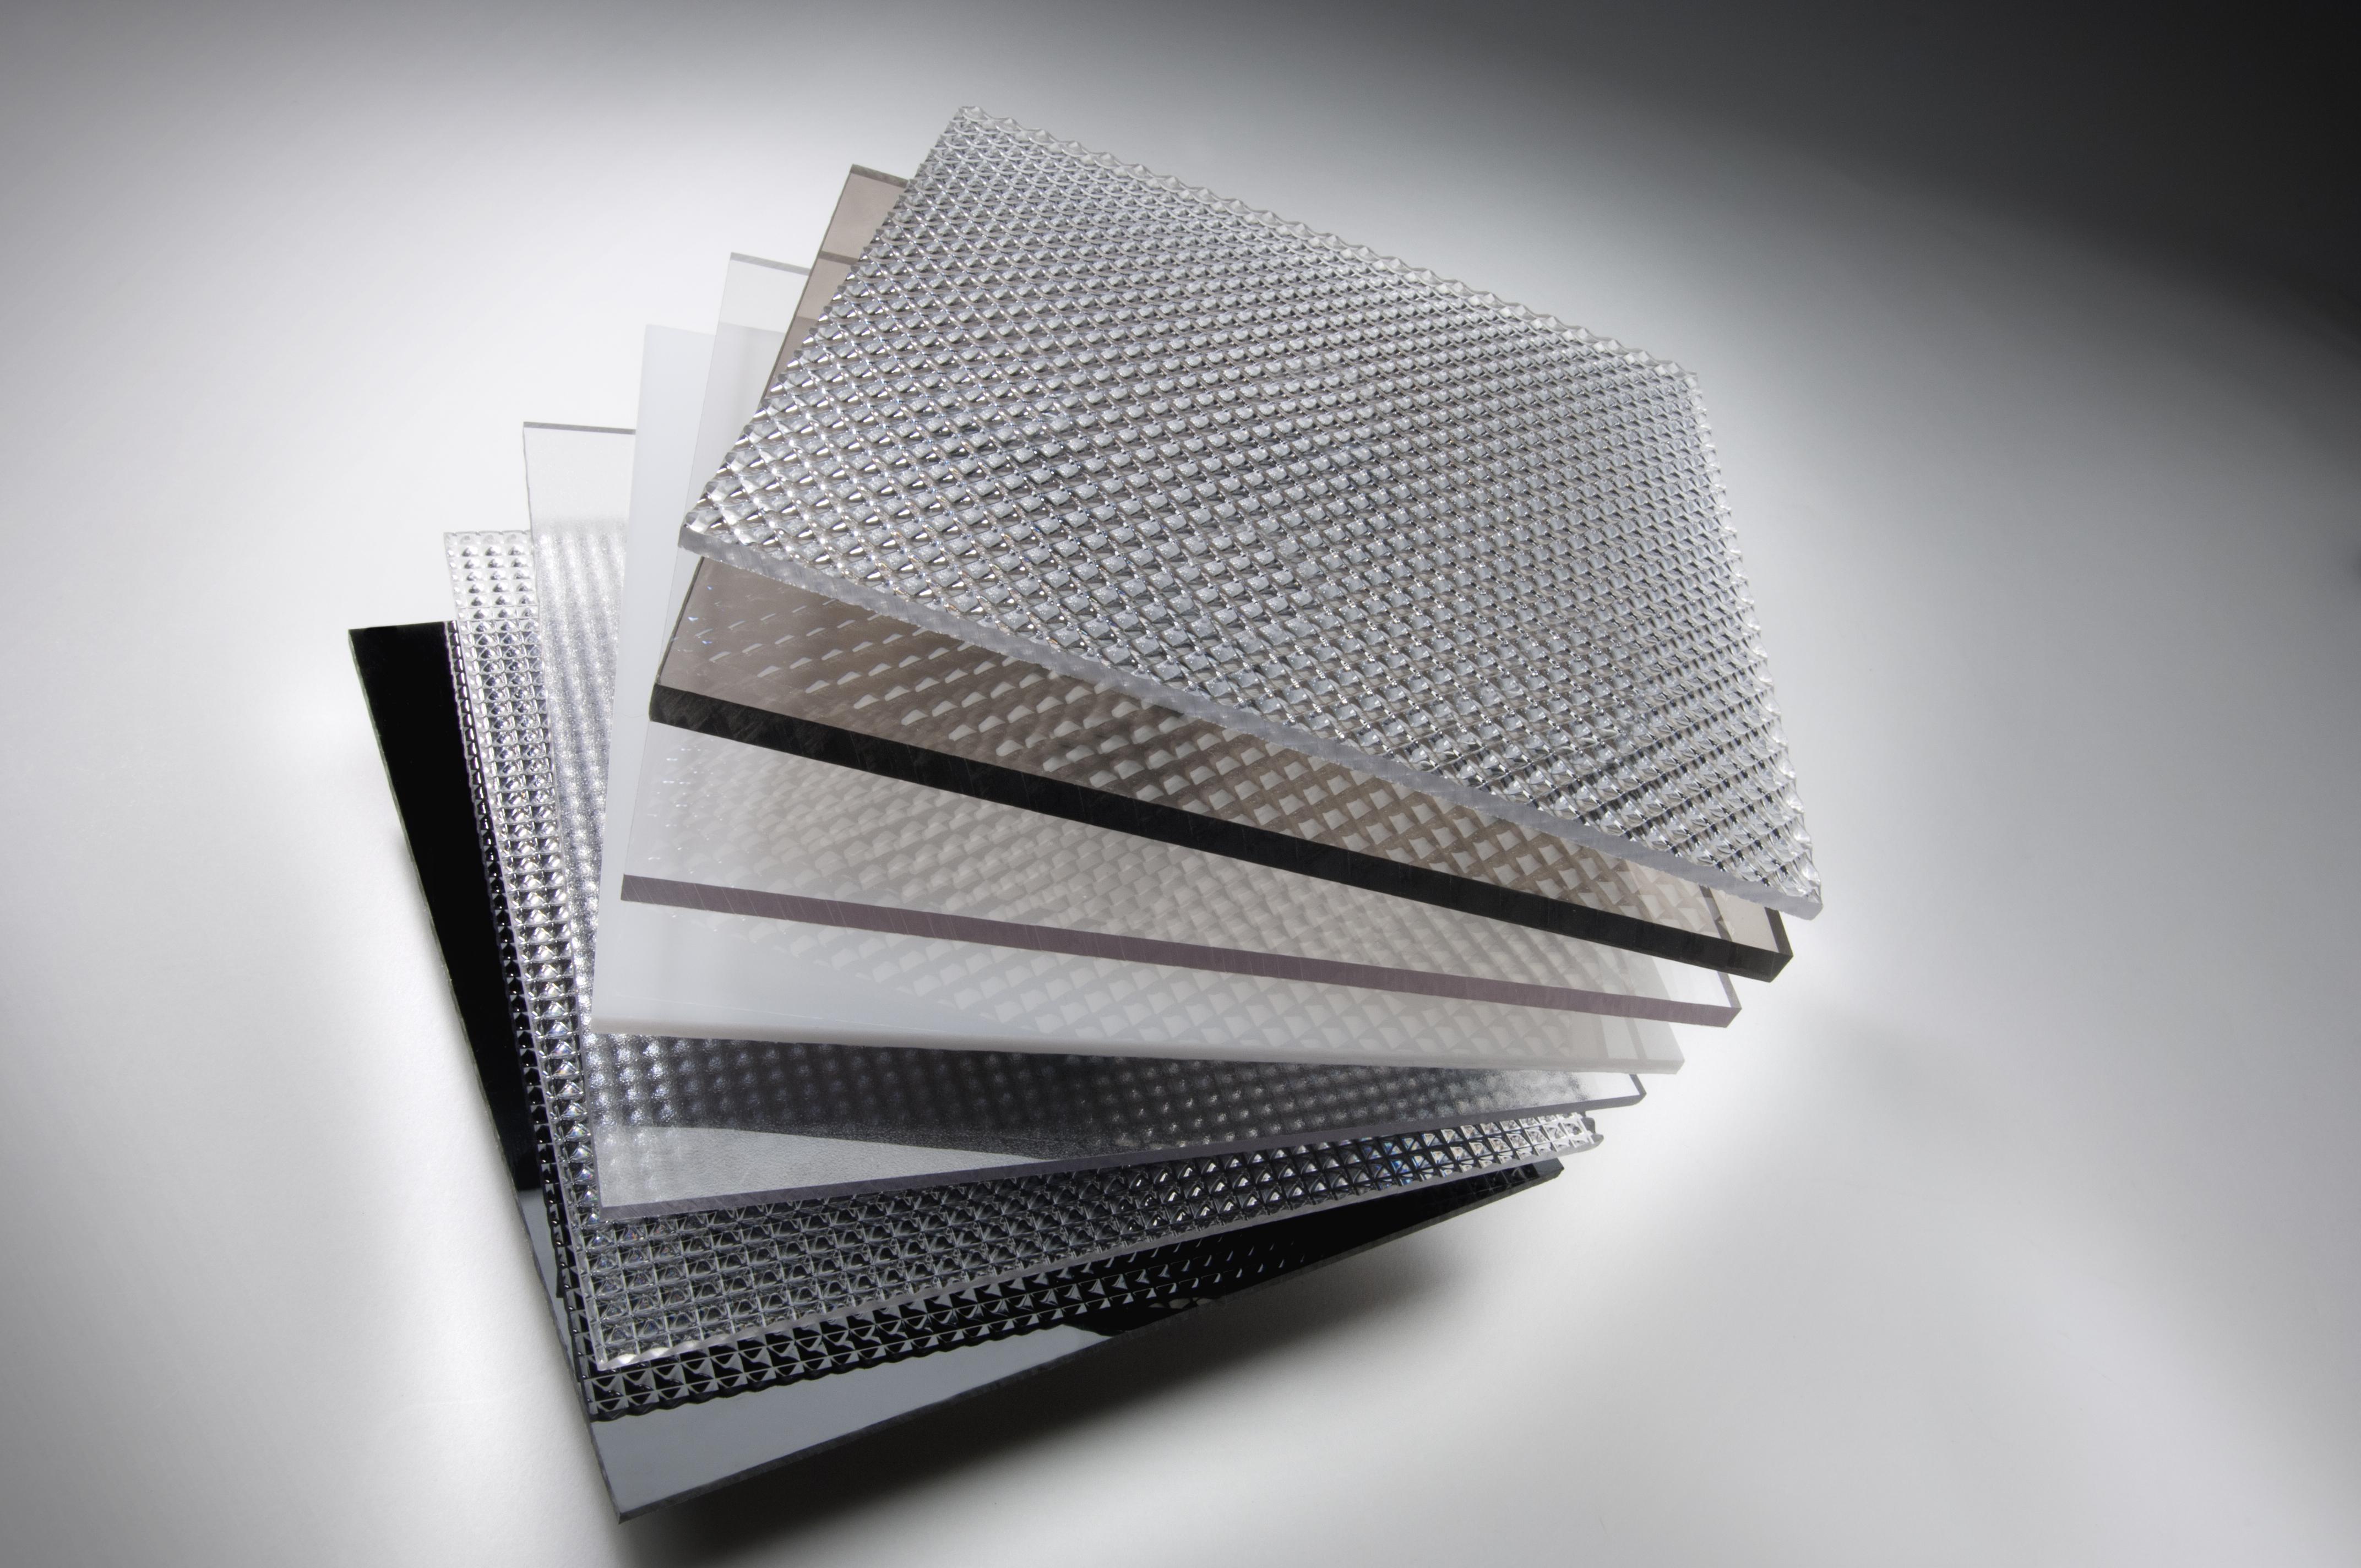 tấm lợp nhựa polycarbonate